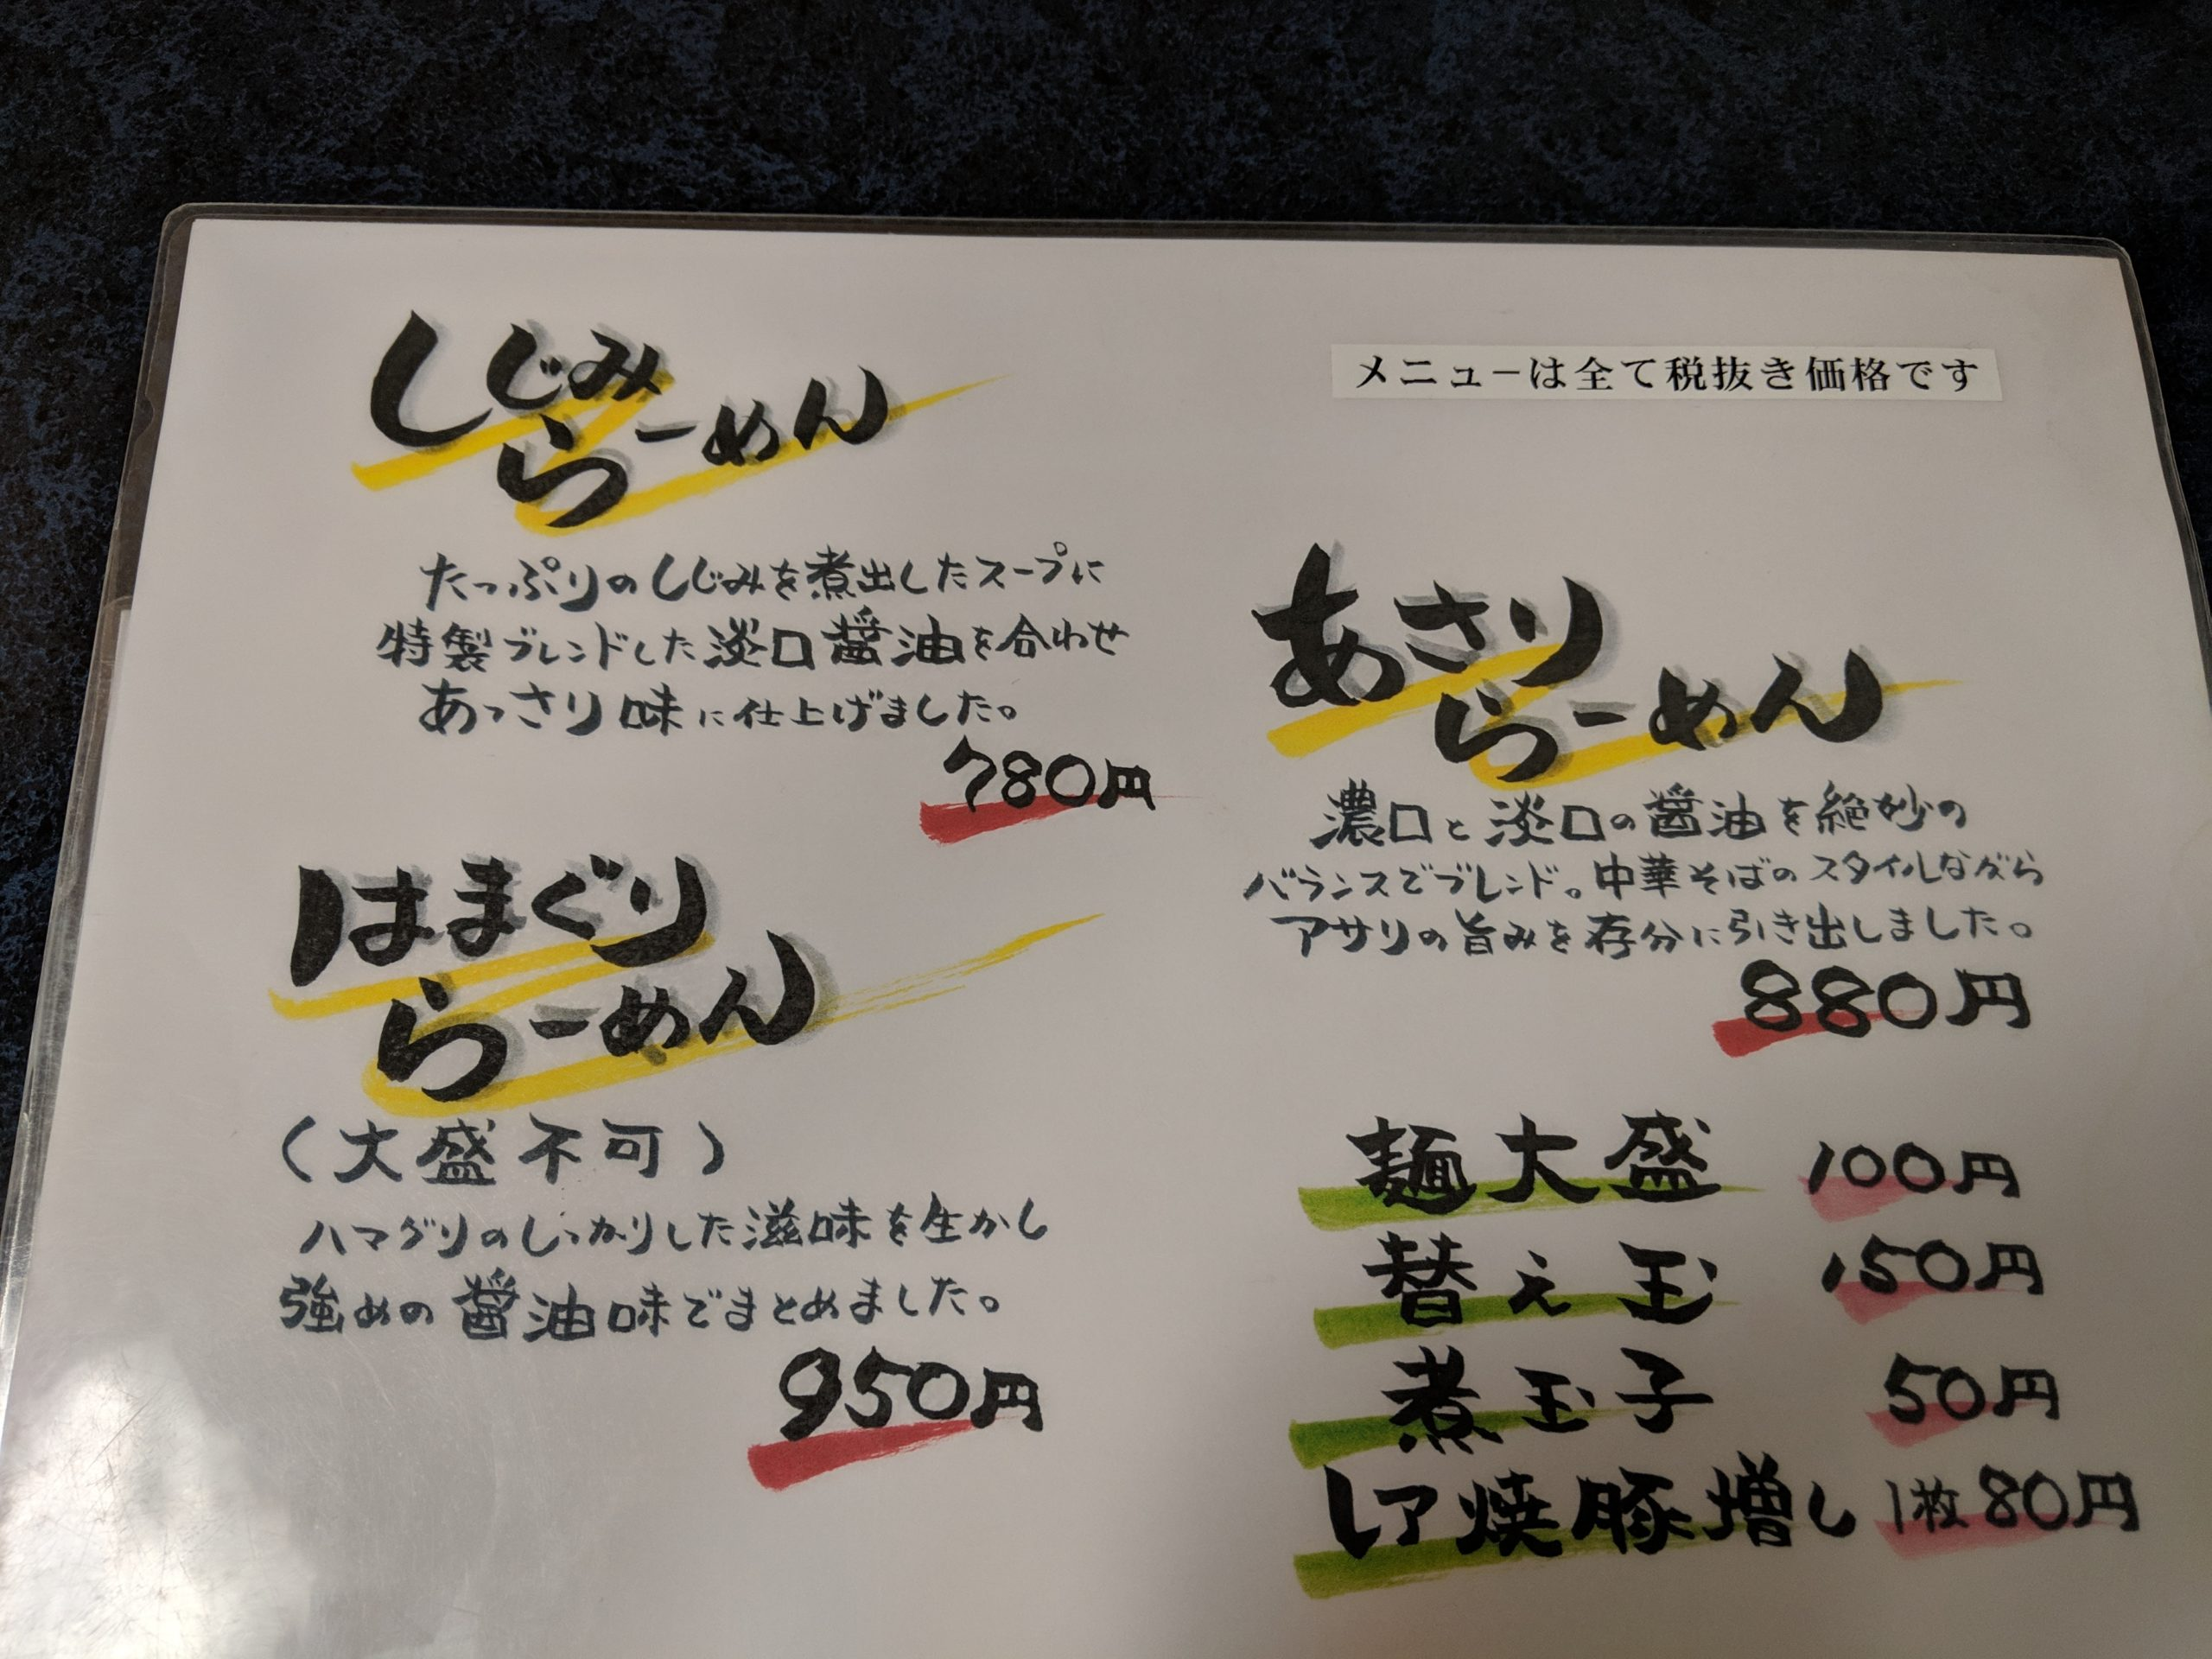 menu, くそオヤジ最後のひとふり, Osaka